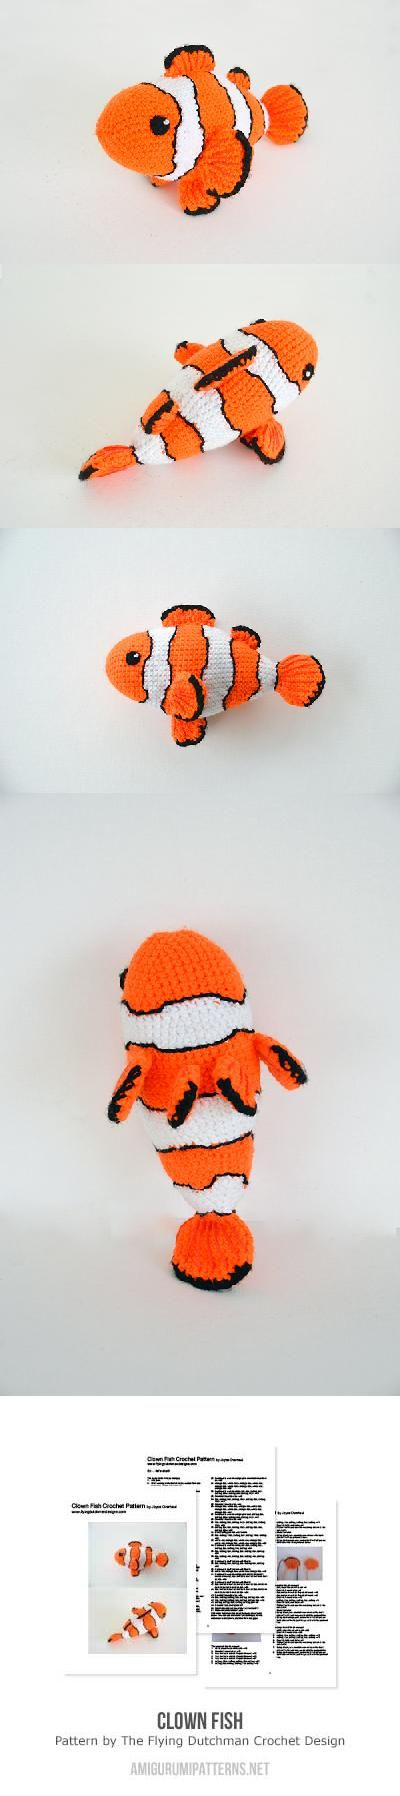 Clown fish amigurumi pattern by The Flying Dutchman Crochet Design